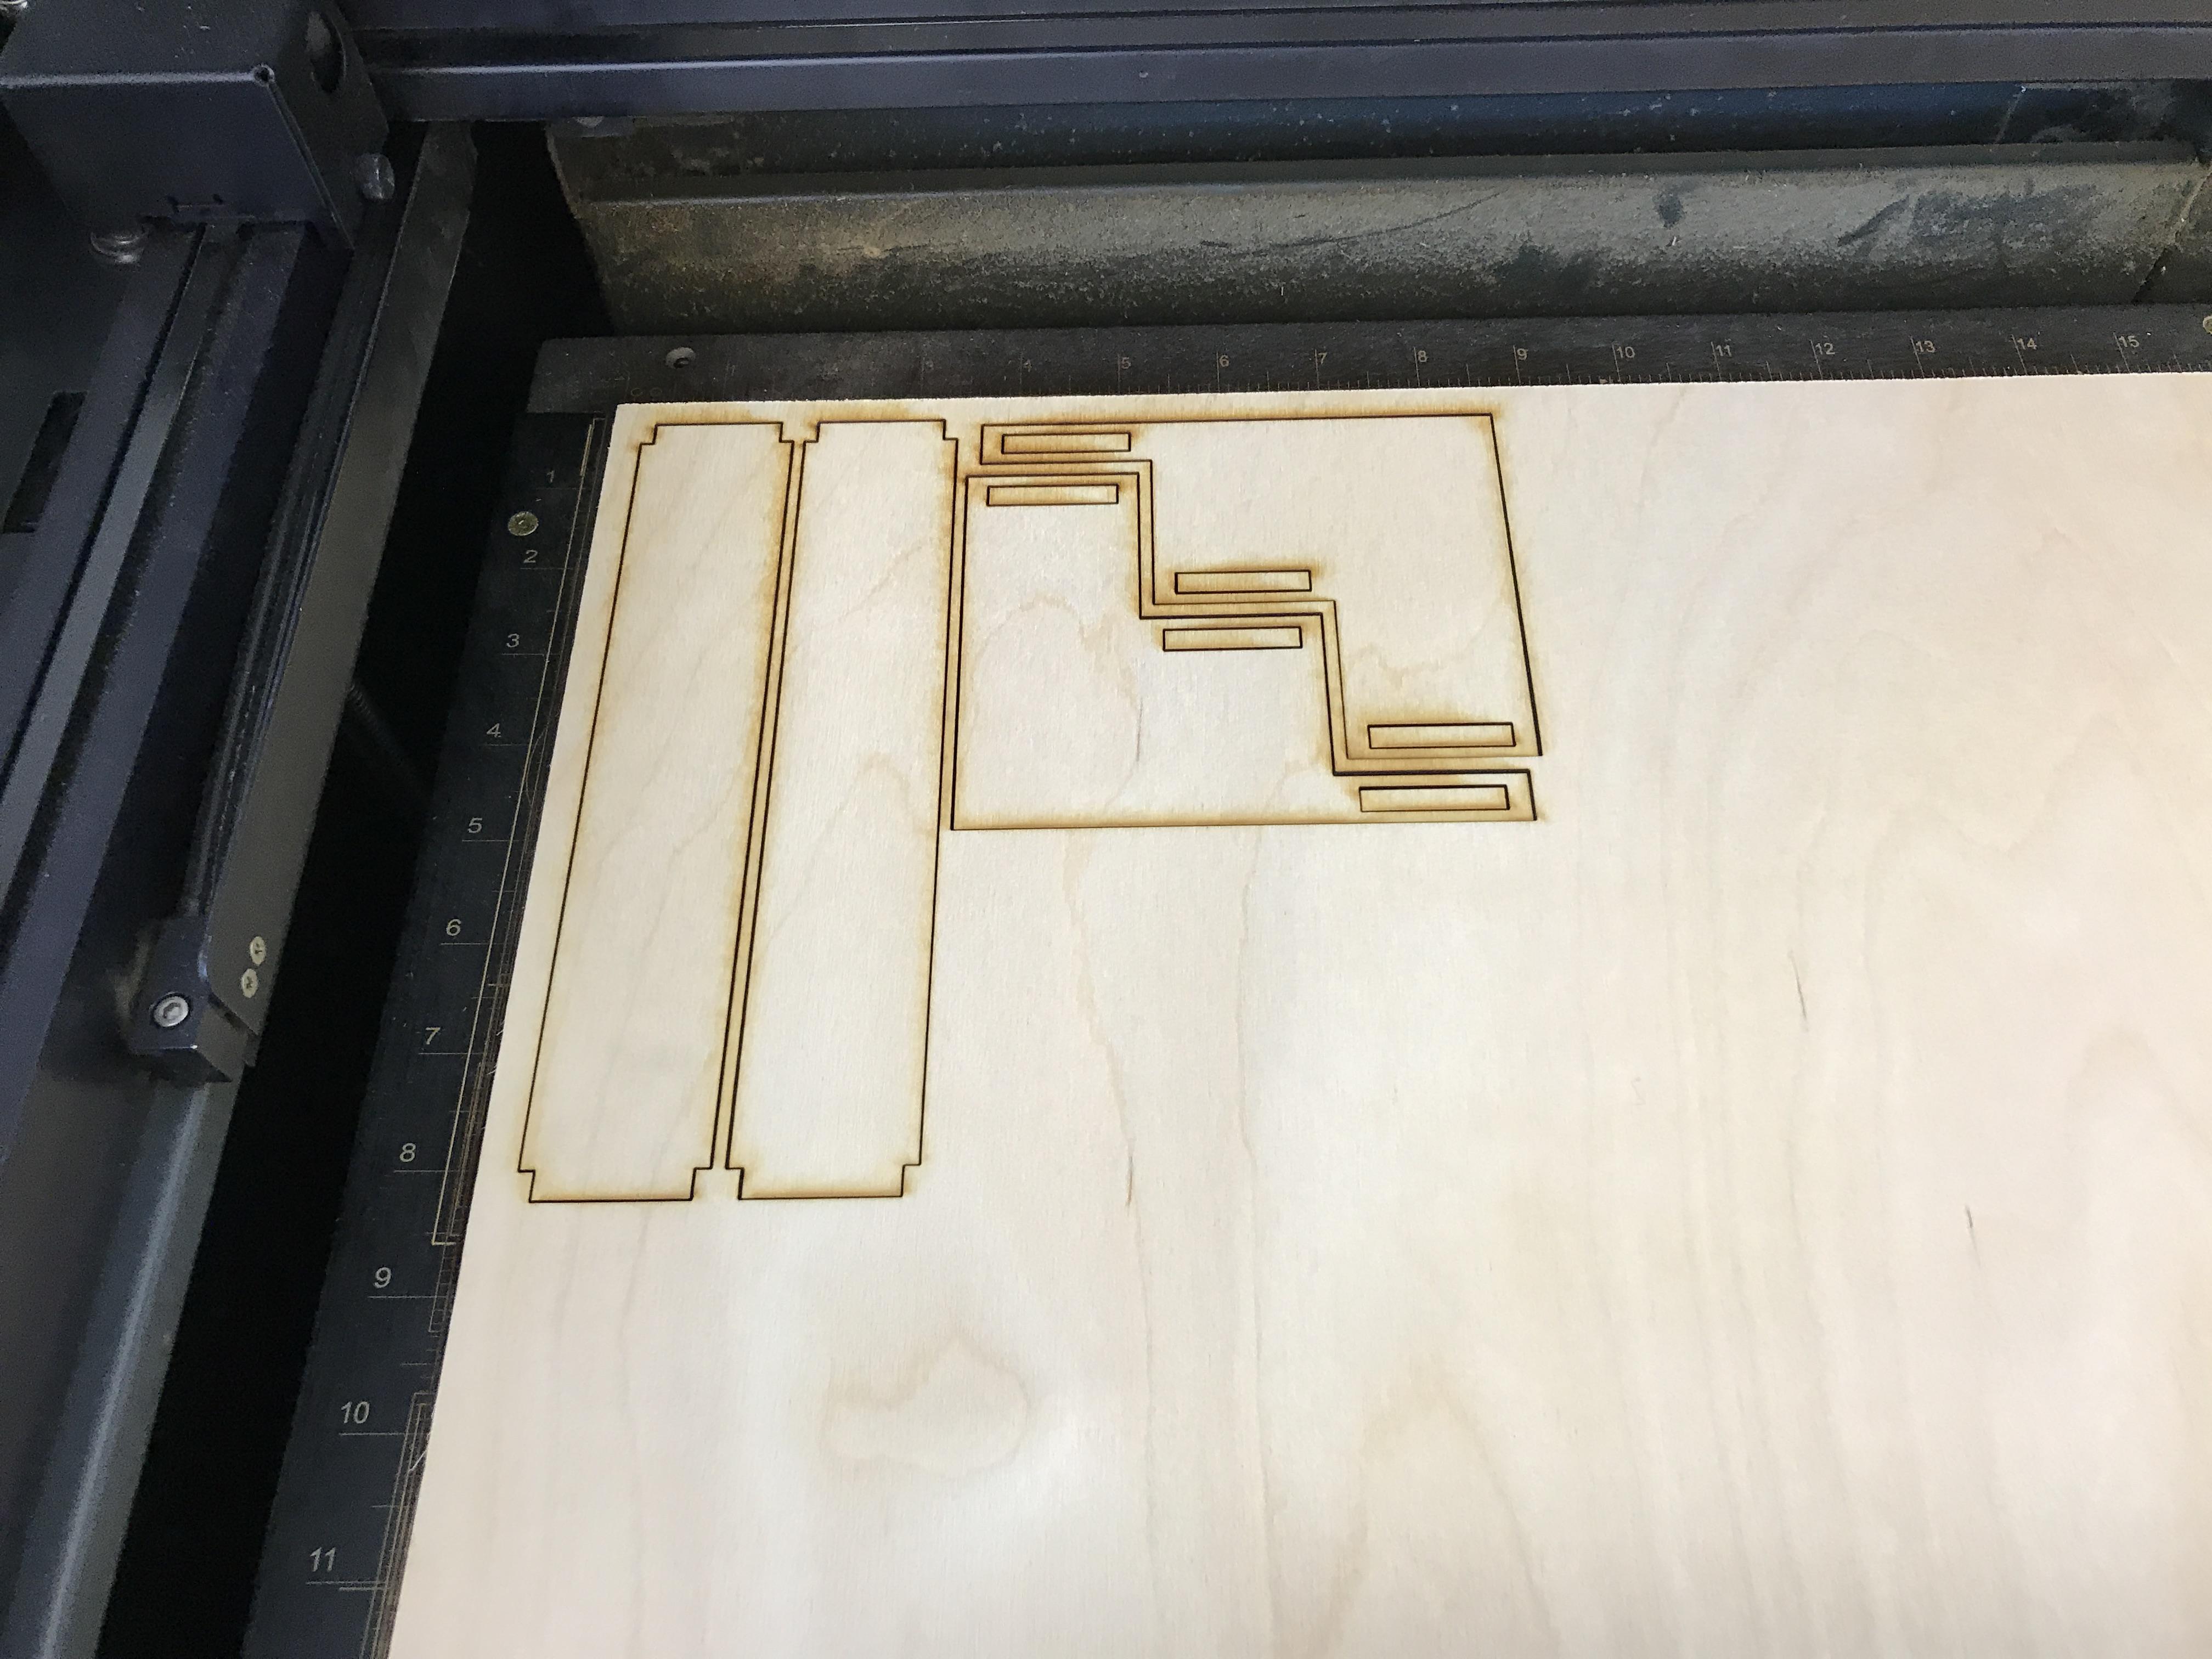 Laser Cut Adjustable Spice Rack Free Vector